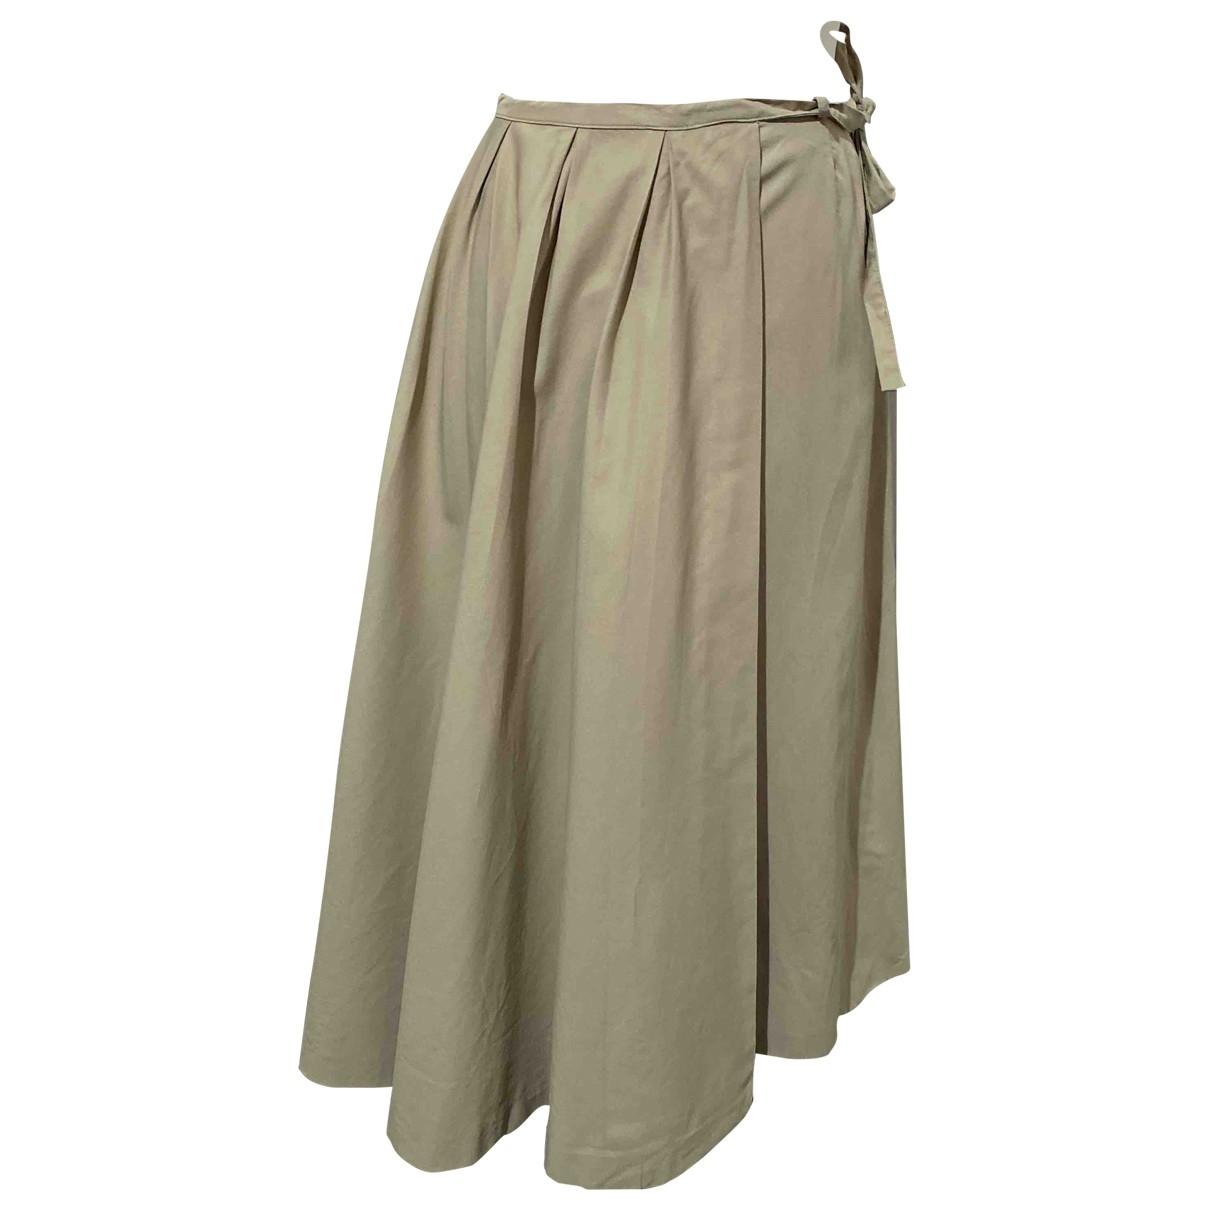 Max Mara \N Beige skirt for Women 40 IT